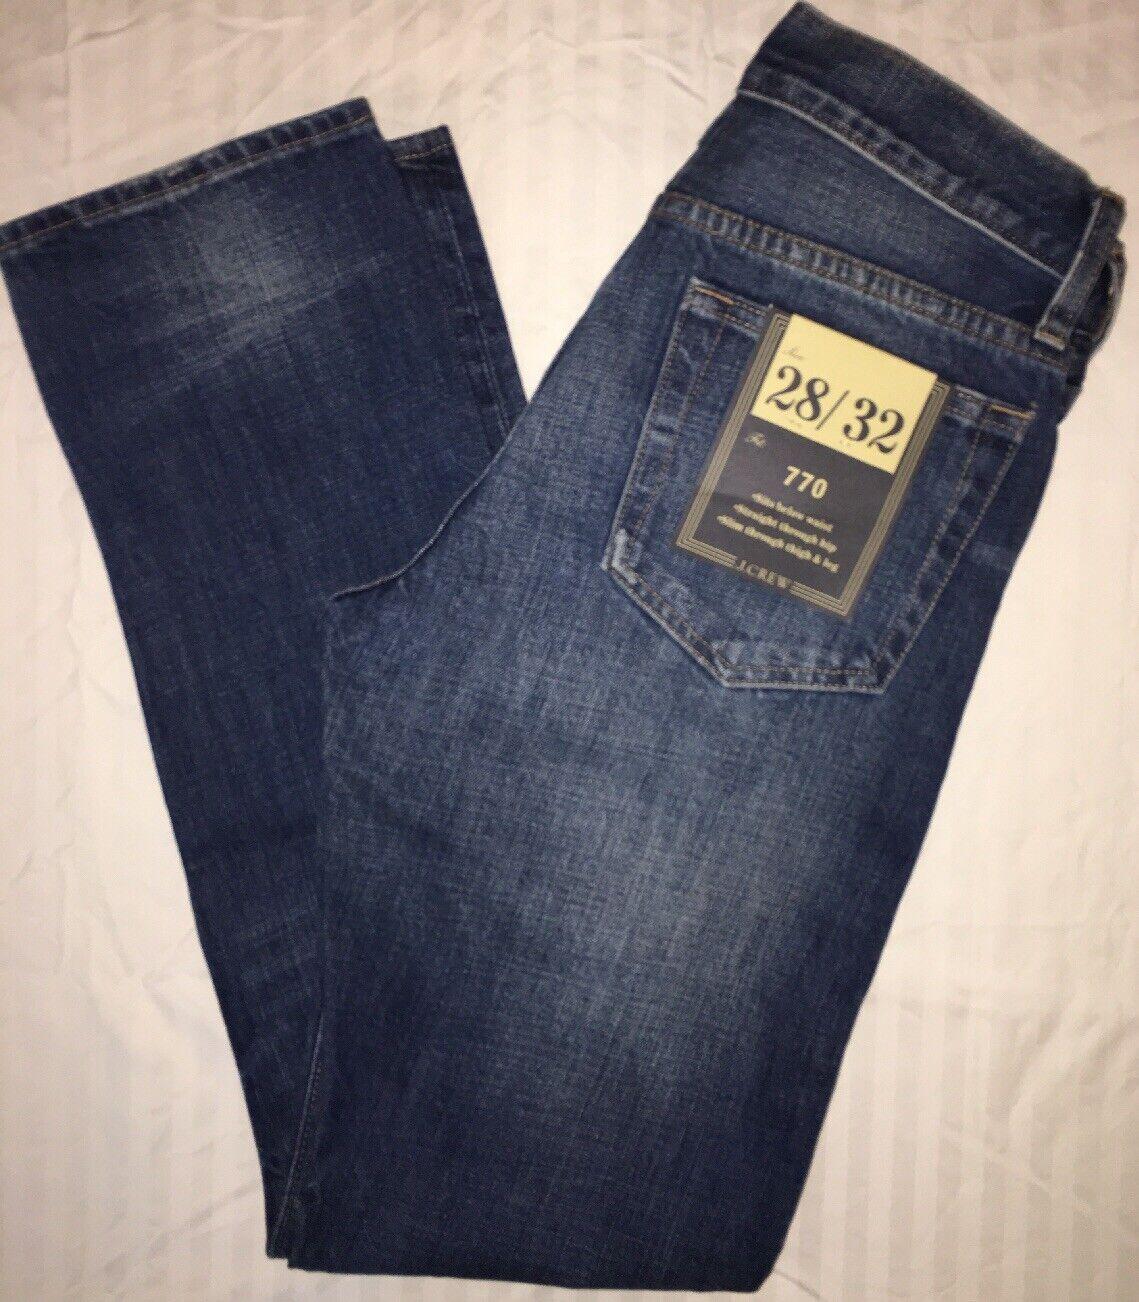 J Crew Jeans 28 32 770 a0656 Vintage Light Wash  NWT VLW